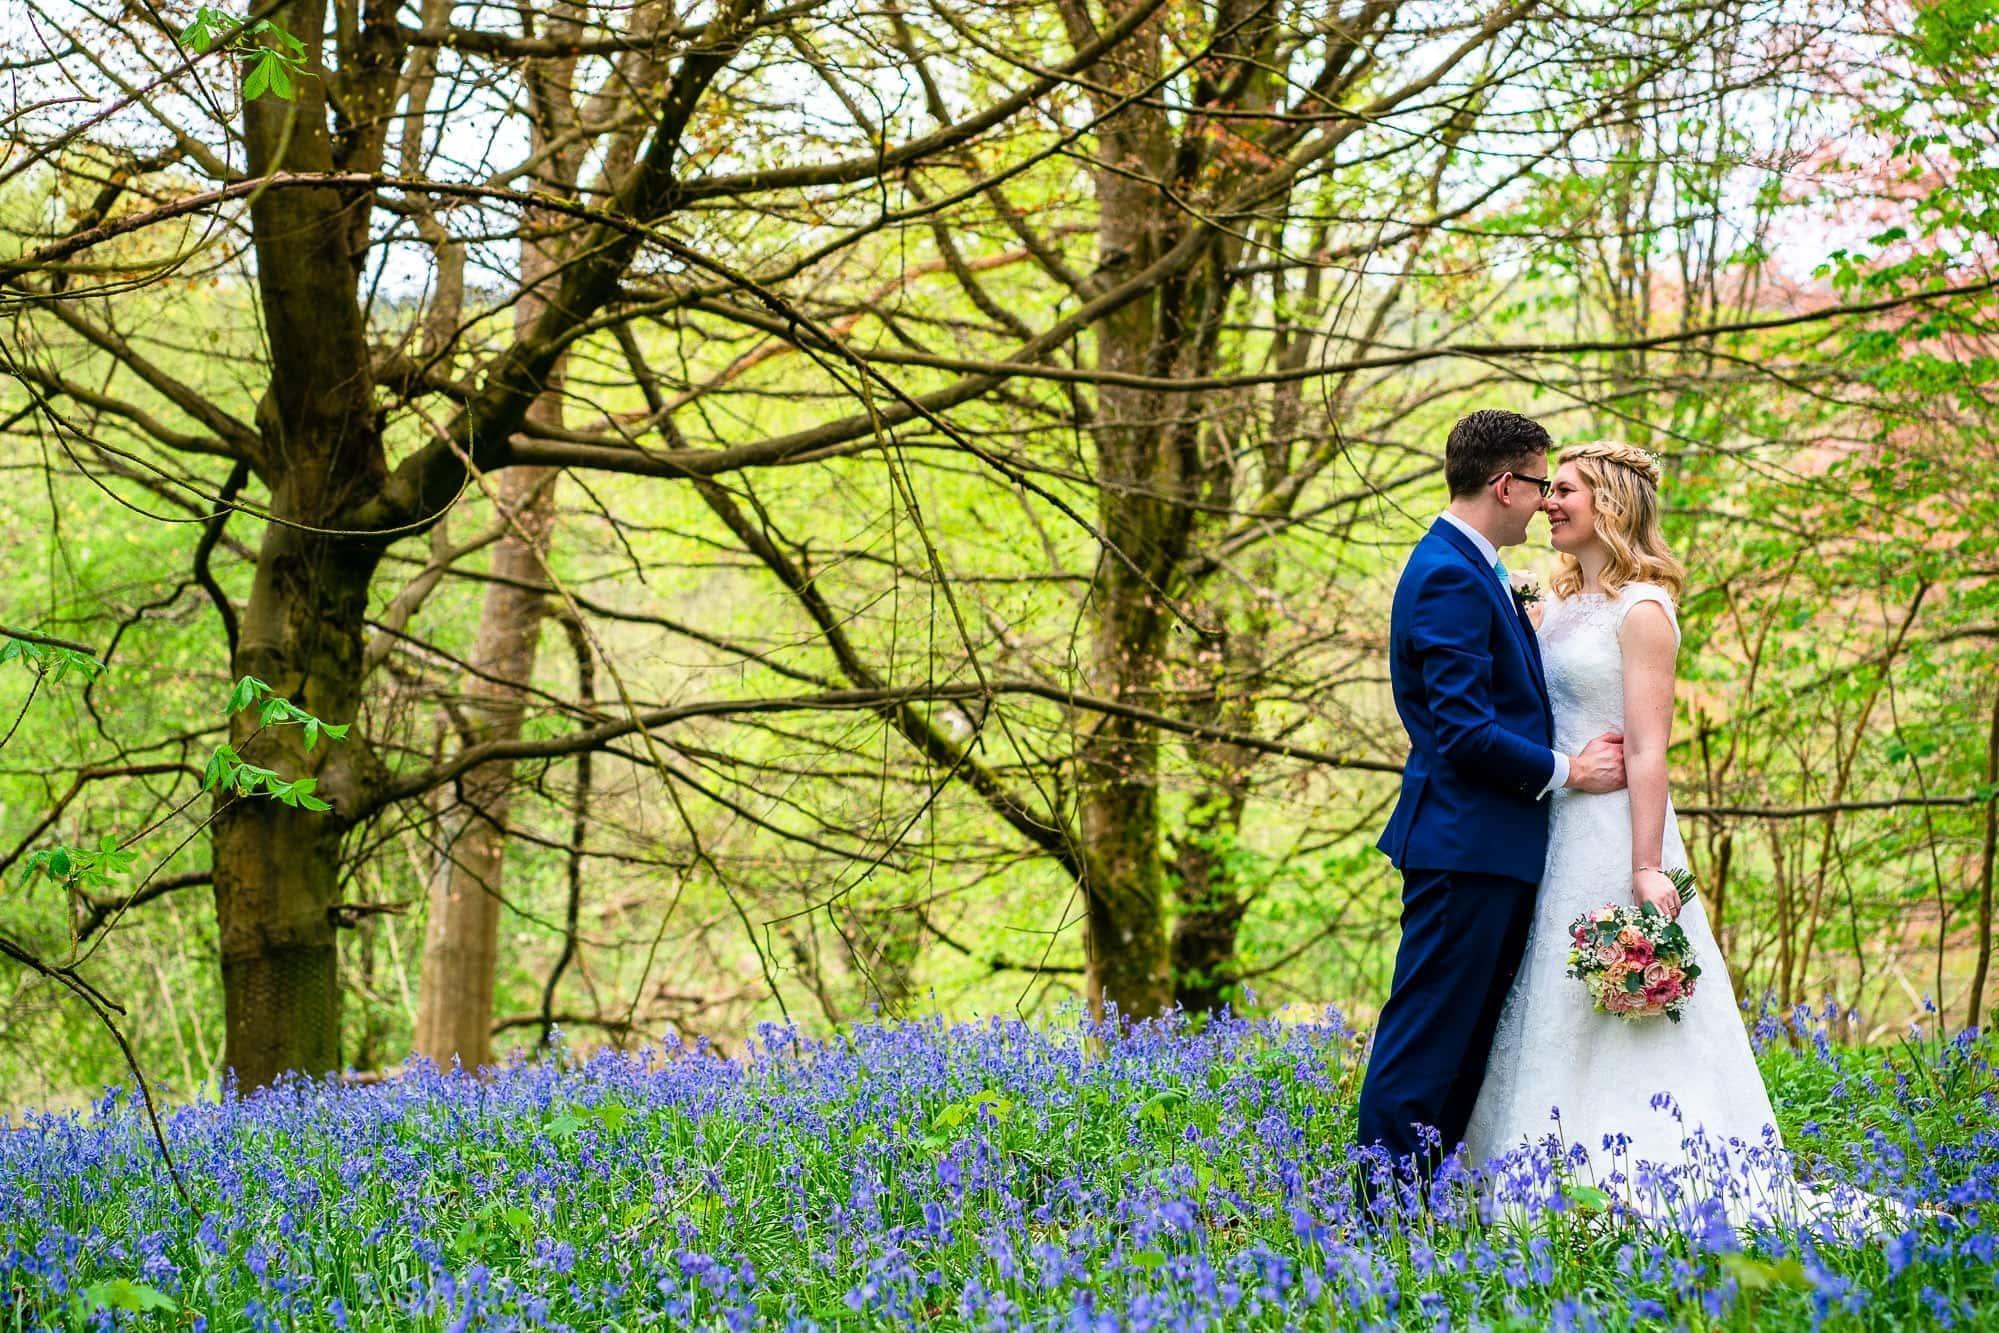 Gate Street Barn Wedding Photography - Bluebell Woods Portrait